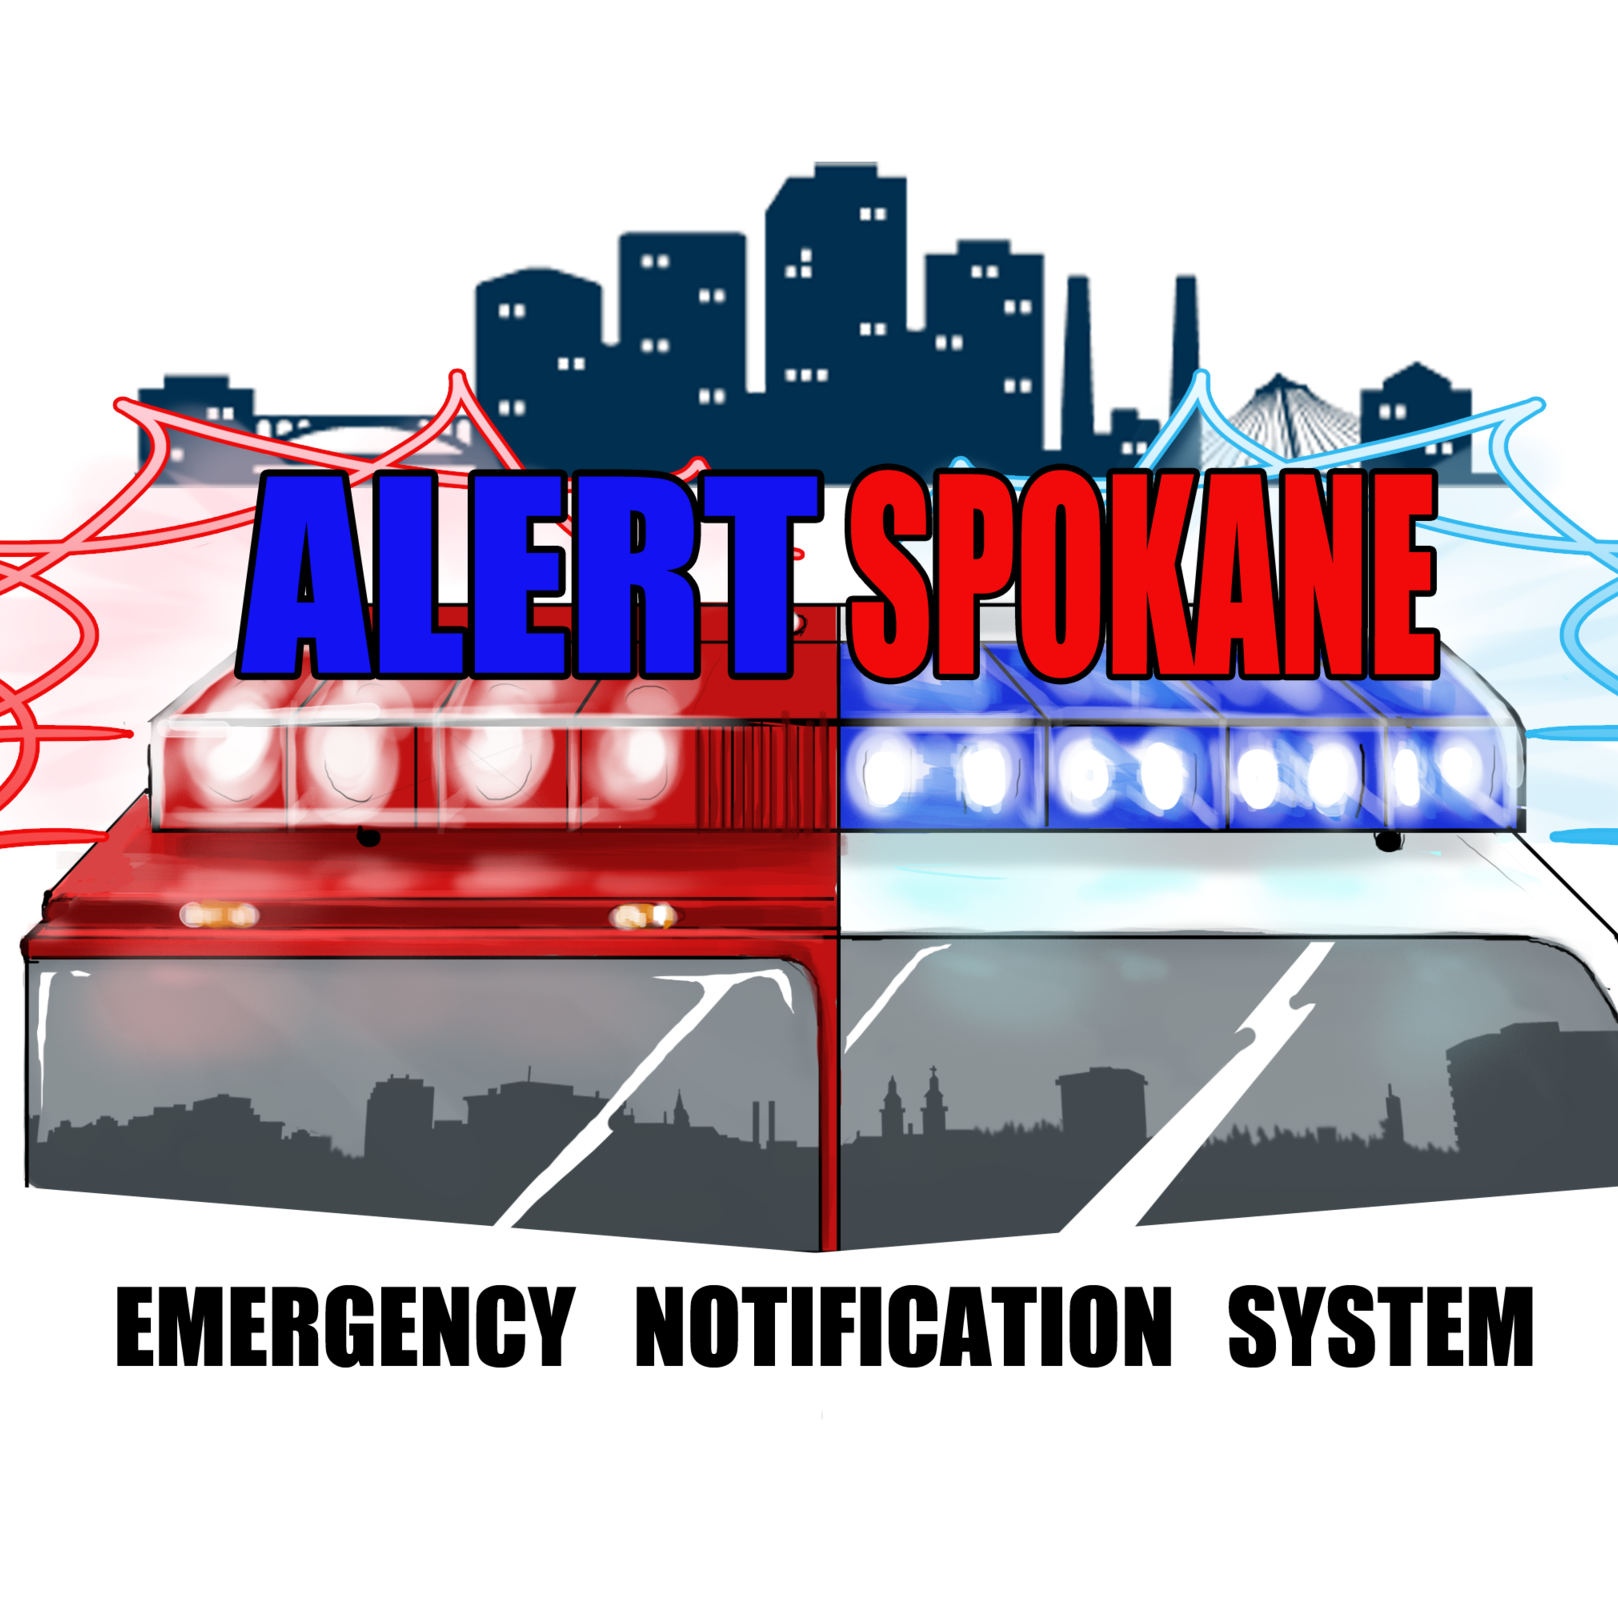 Alert Spokane image